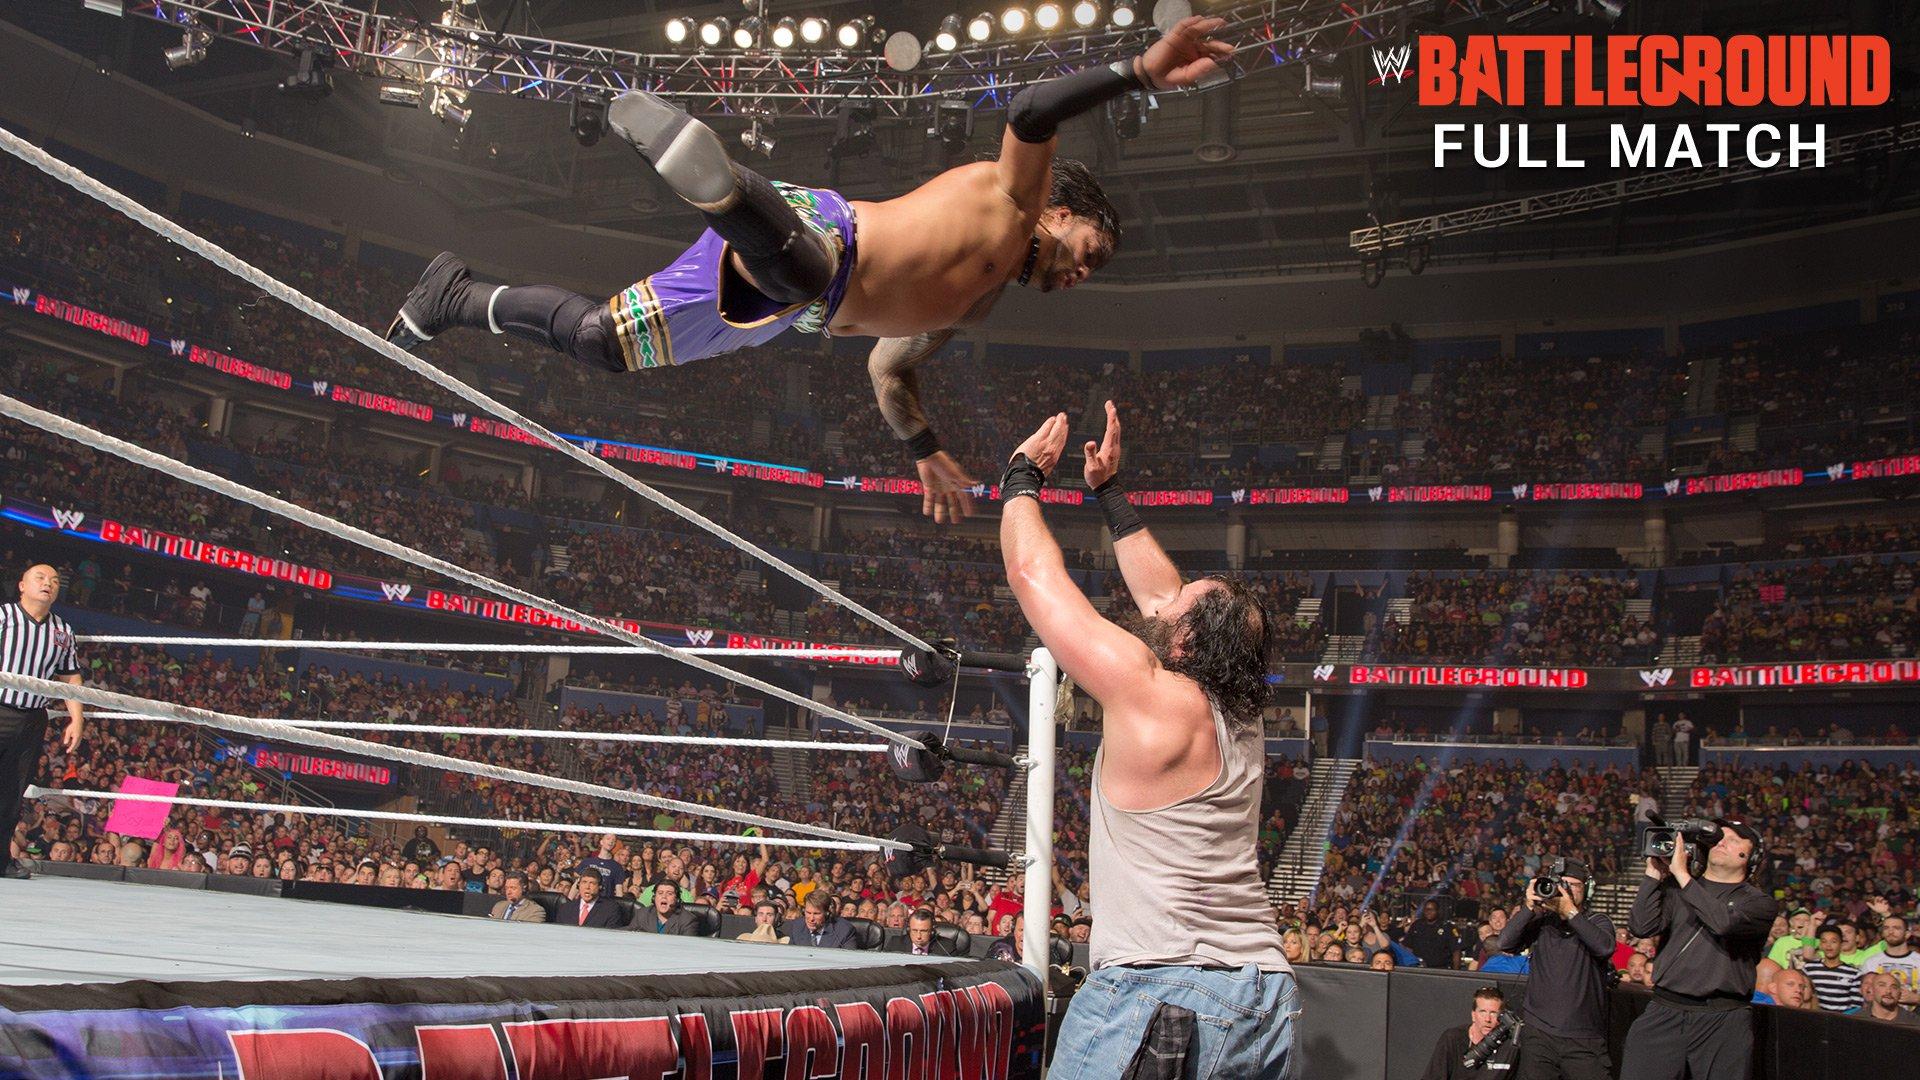 Image result for Battleground 2014 The Usos vs The Wyatt Family